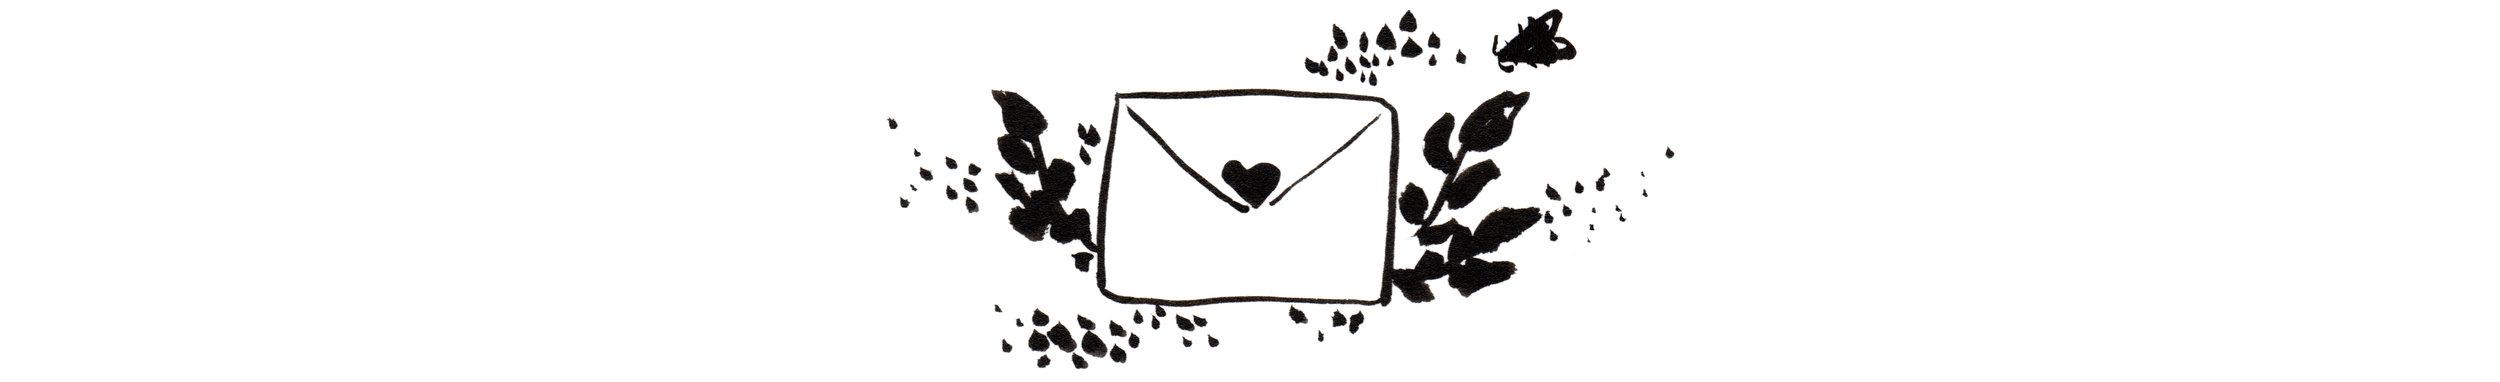 Envelopeb.jpg